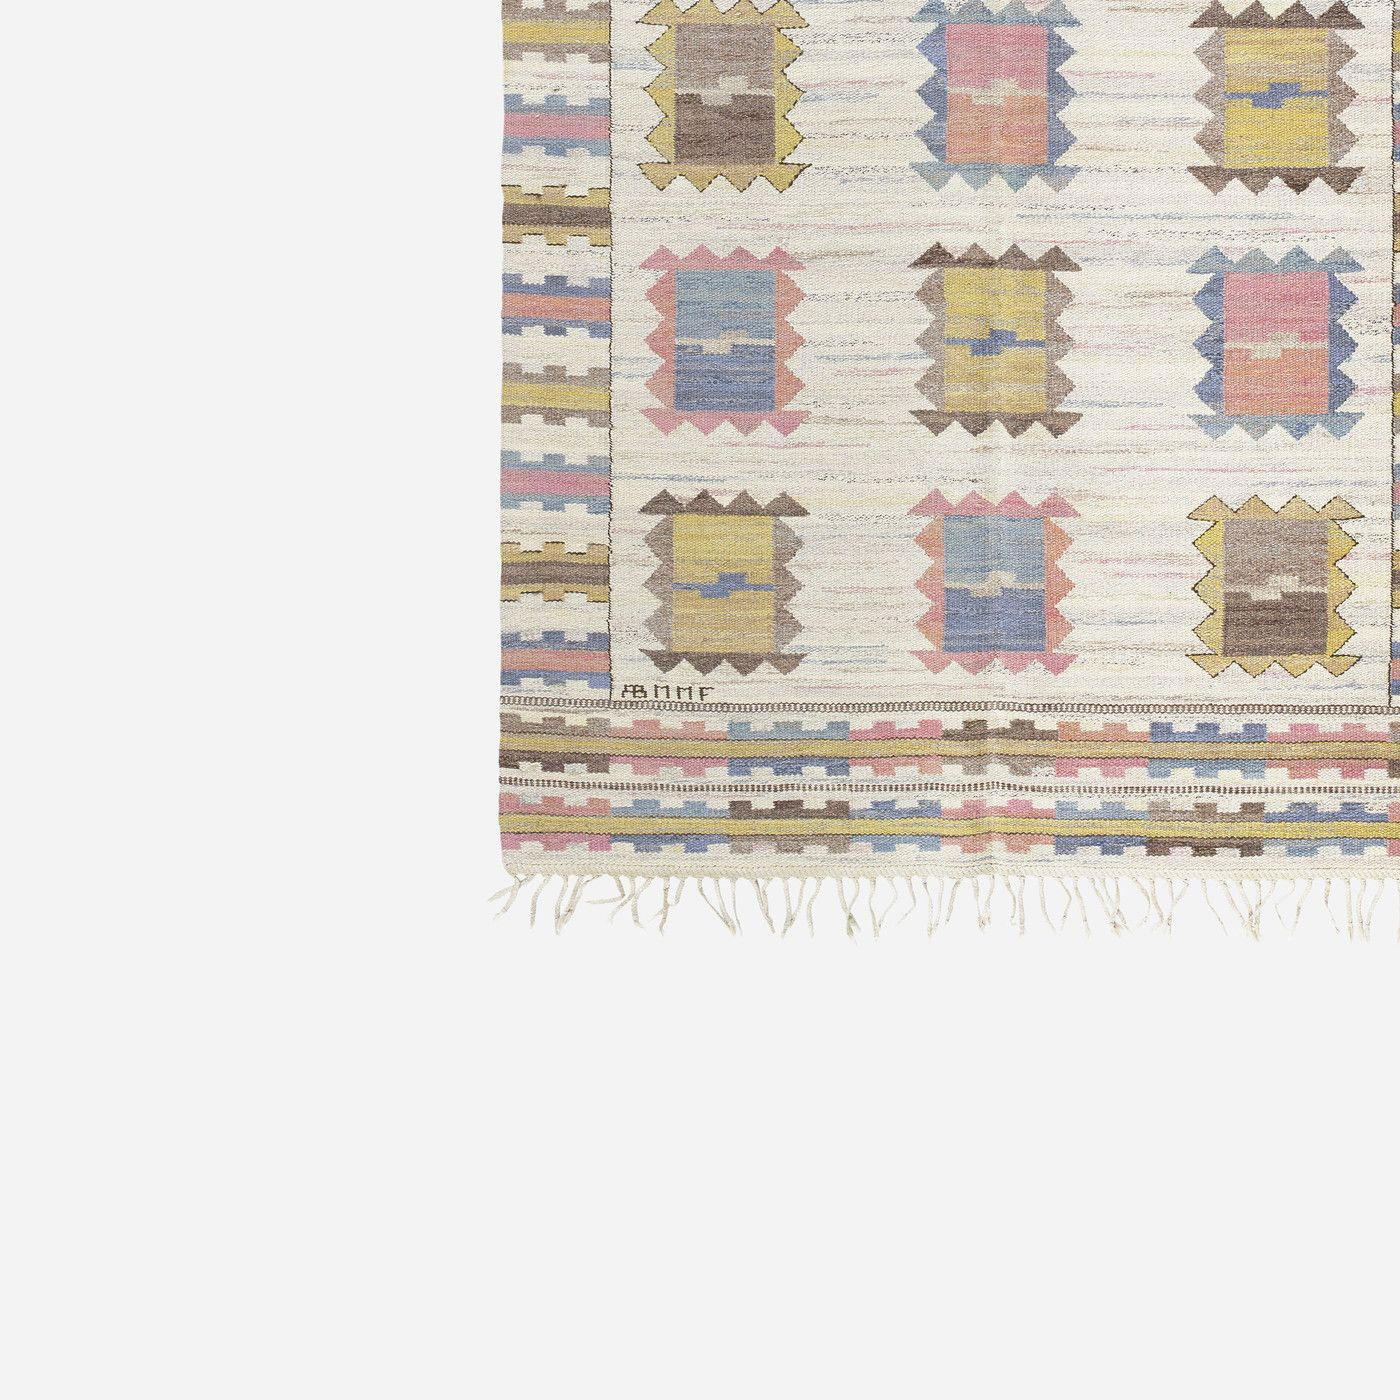 530: Märta Måås-Fjetterström / Ljusa Plador flatweave carpet < 20th Century Carpets, 12 June 2015 < Auctions | Wright